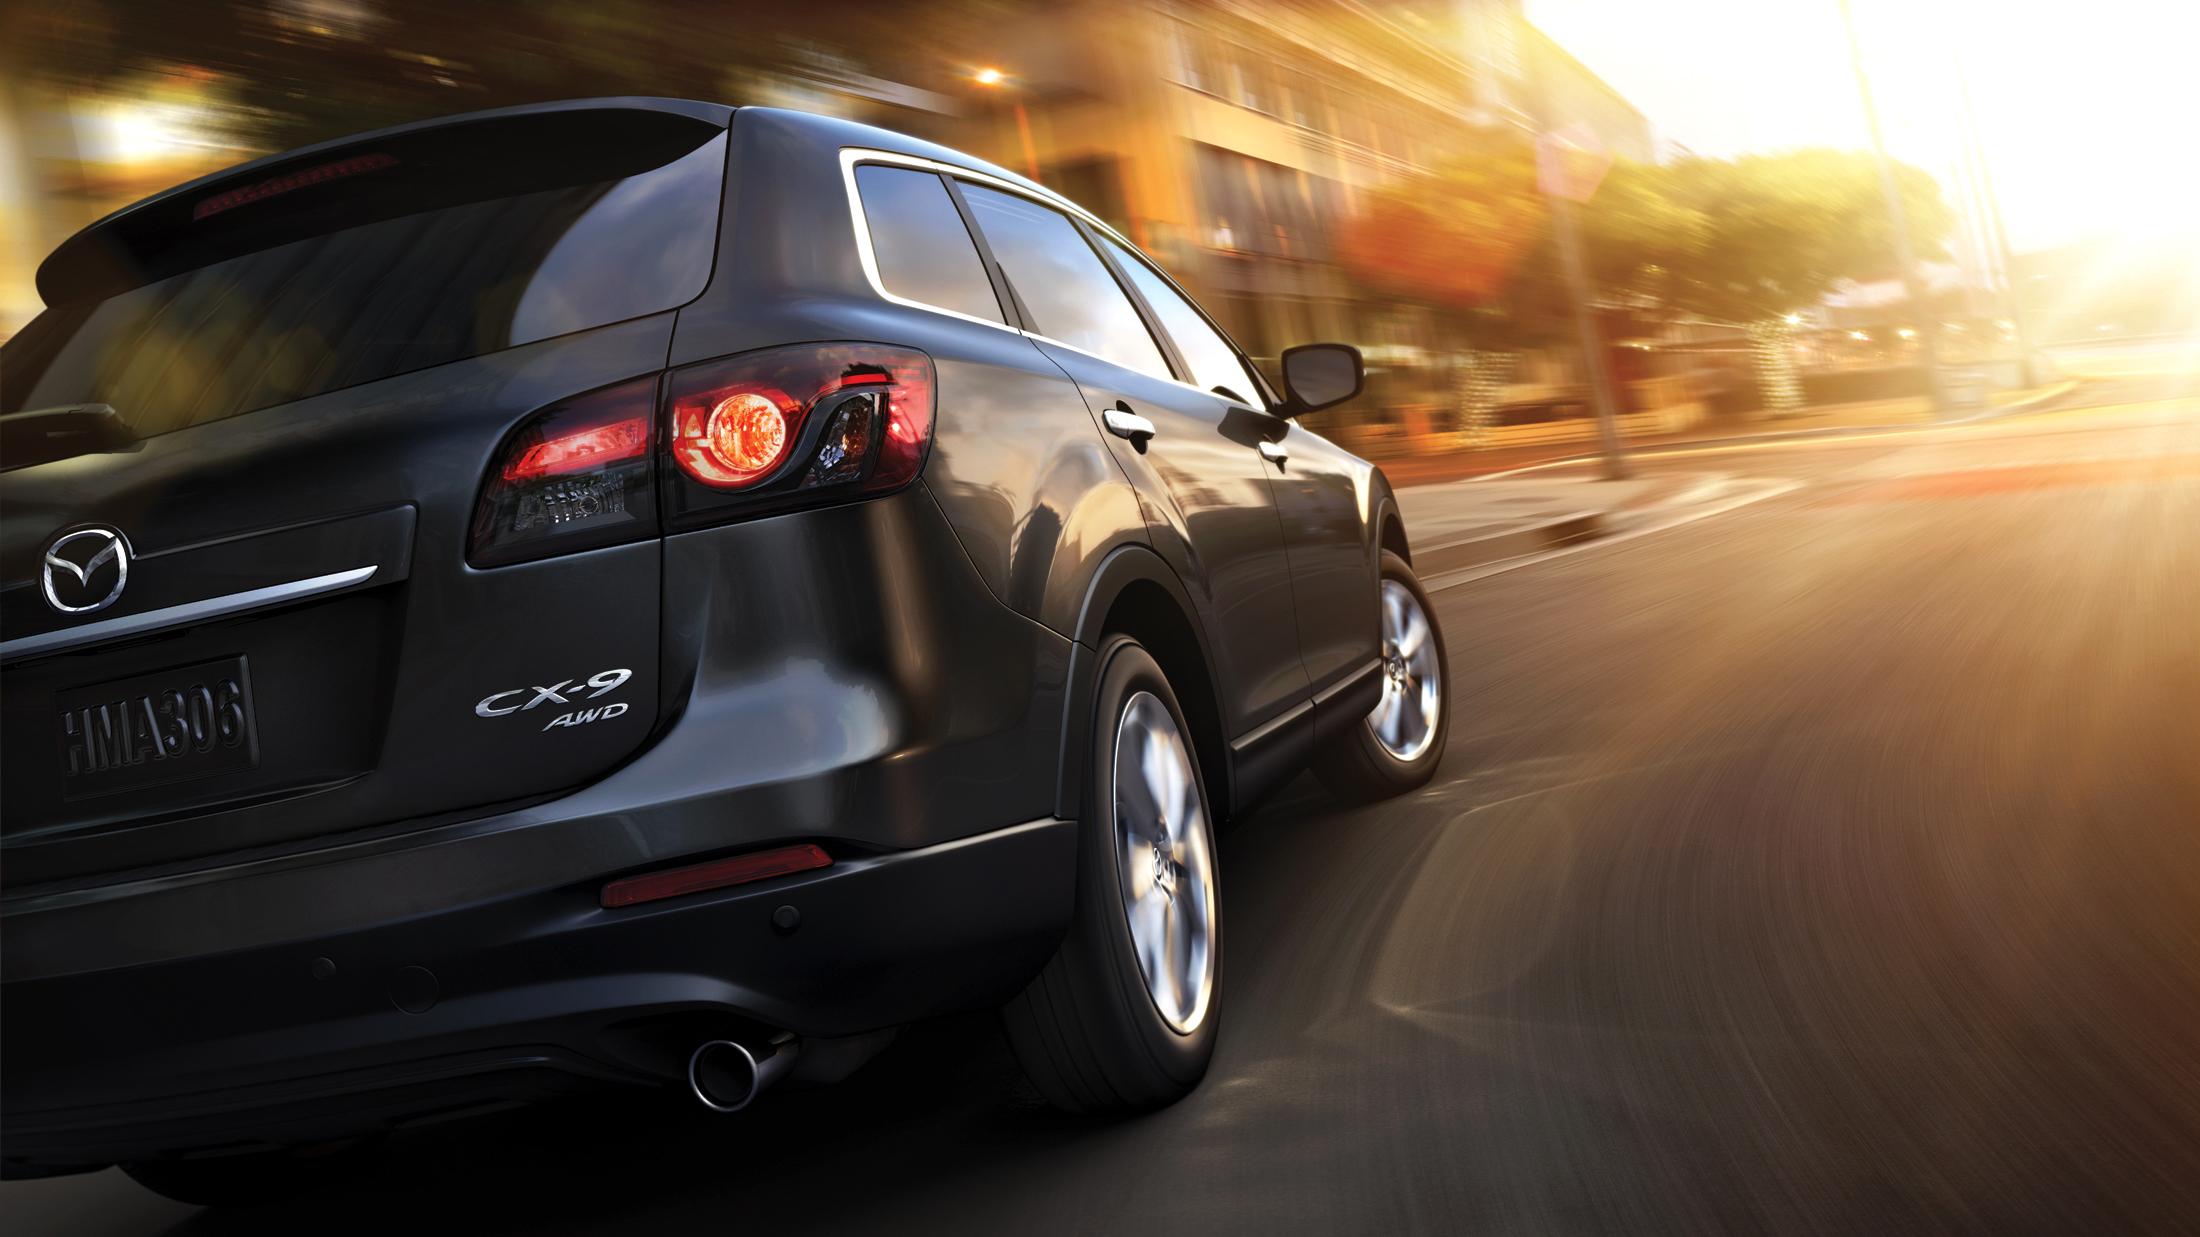 Mazda_CX-9_2012_Rear.jpg